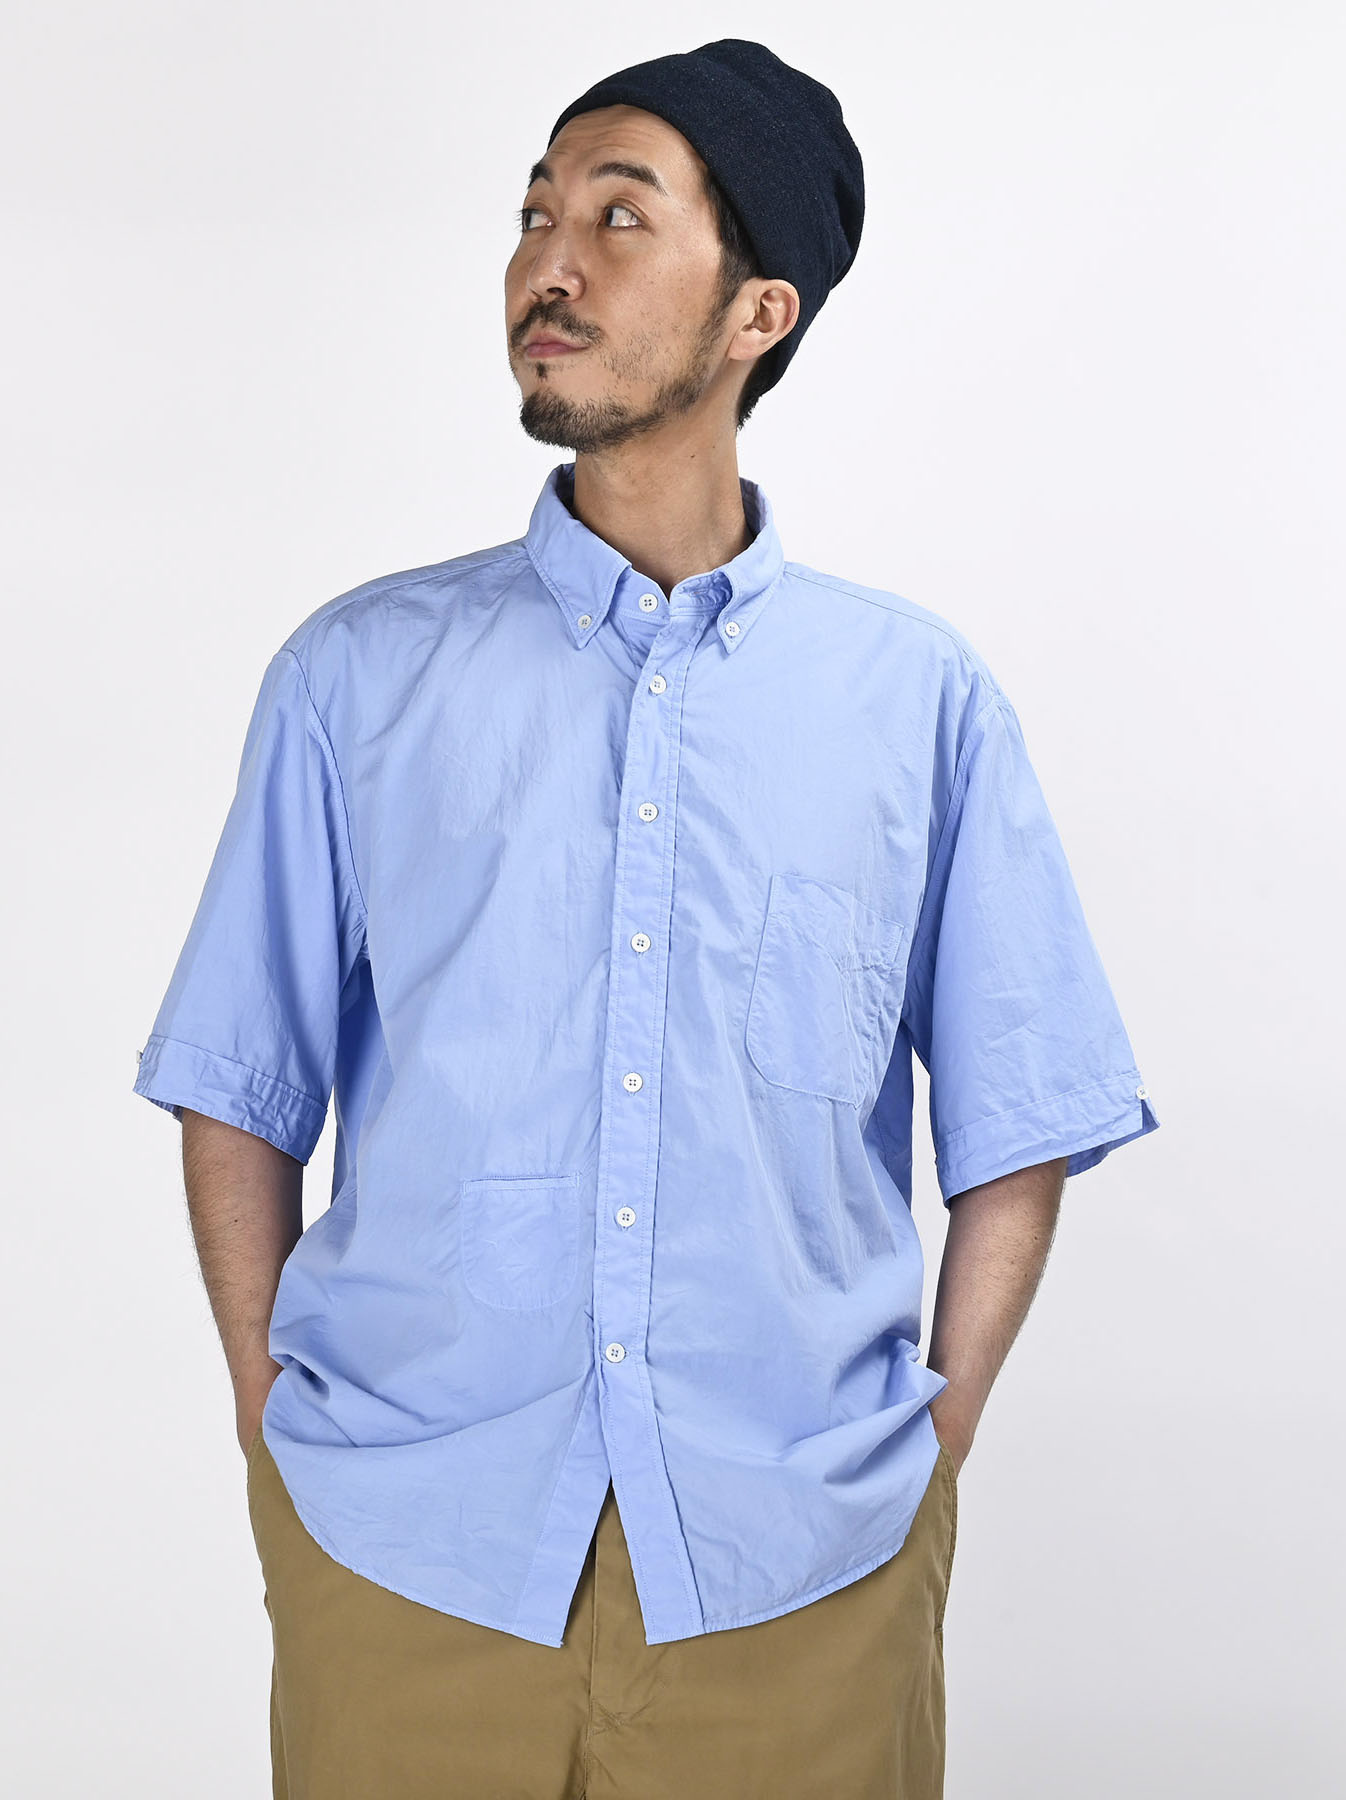 Damp Cotton Anuenue Ocean Shirt (0621)-5